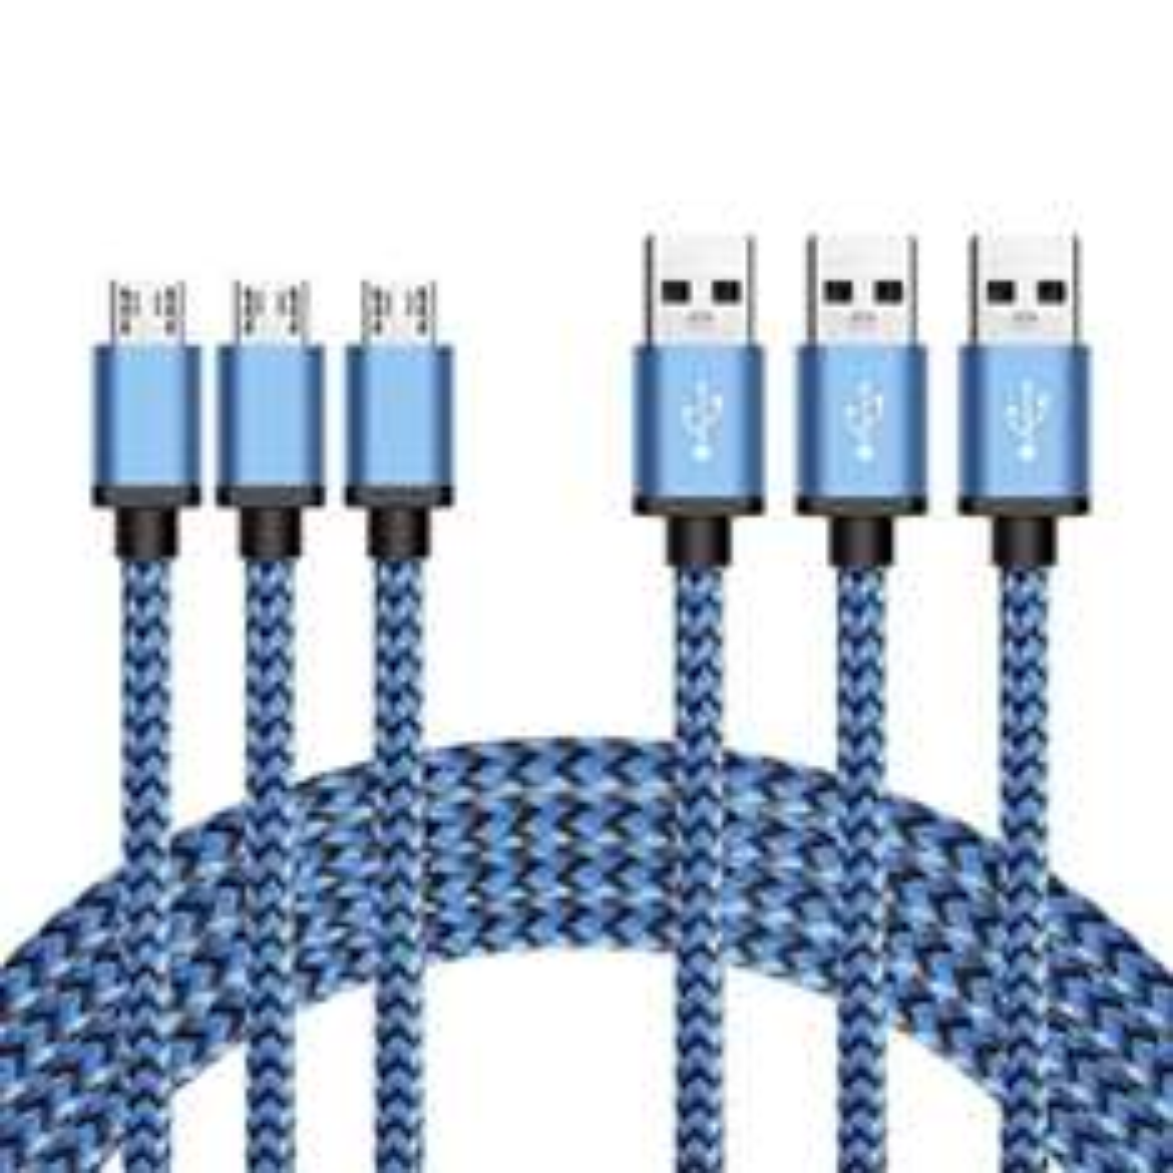 [Amazon Prime] Micro-USB Nylonkabel (3 x 3m) für 7,99€ (VGP: 10,99€)